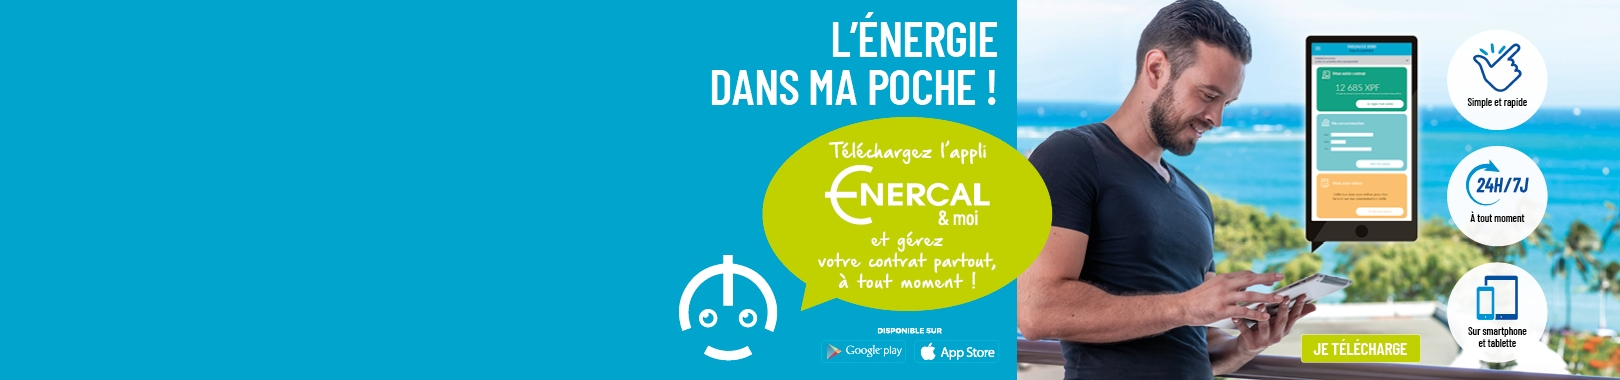 enercal-campagne_appli-slidesite-1620x380.jpg